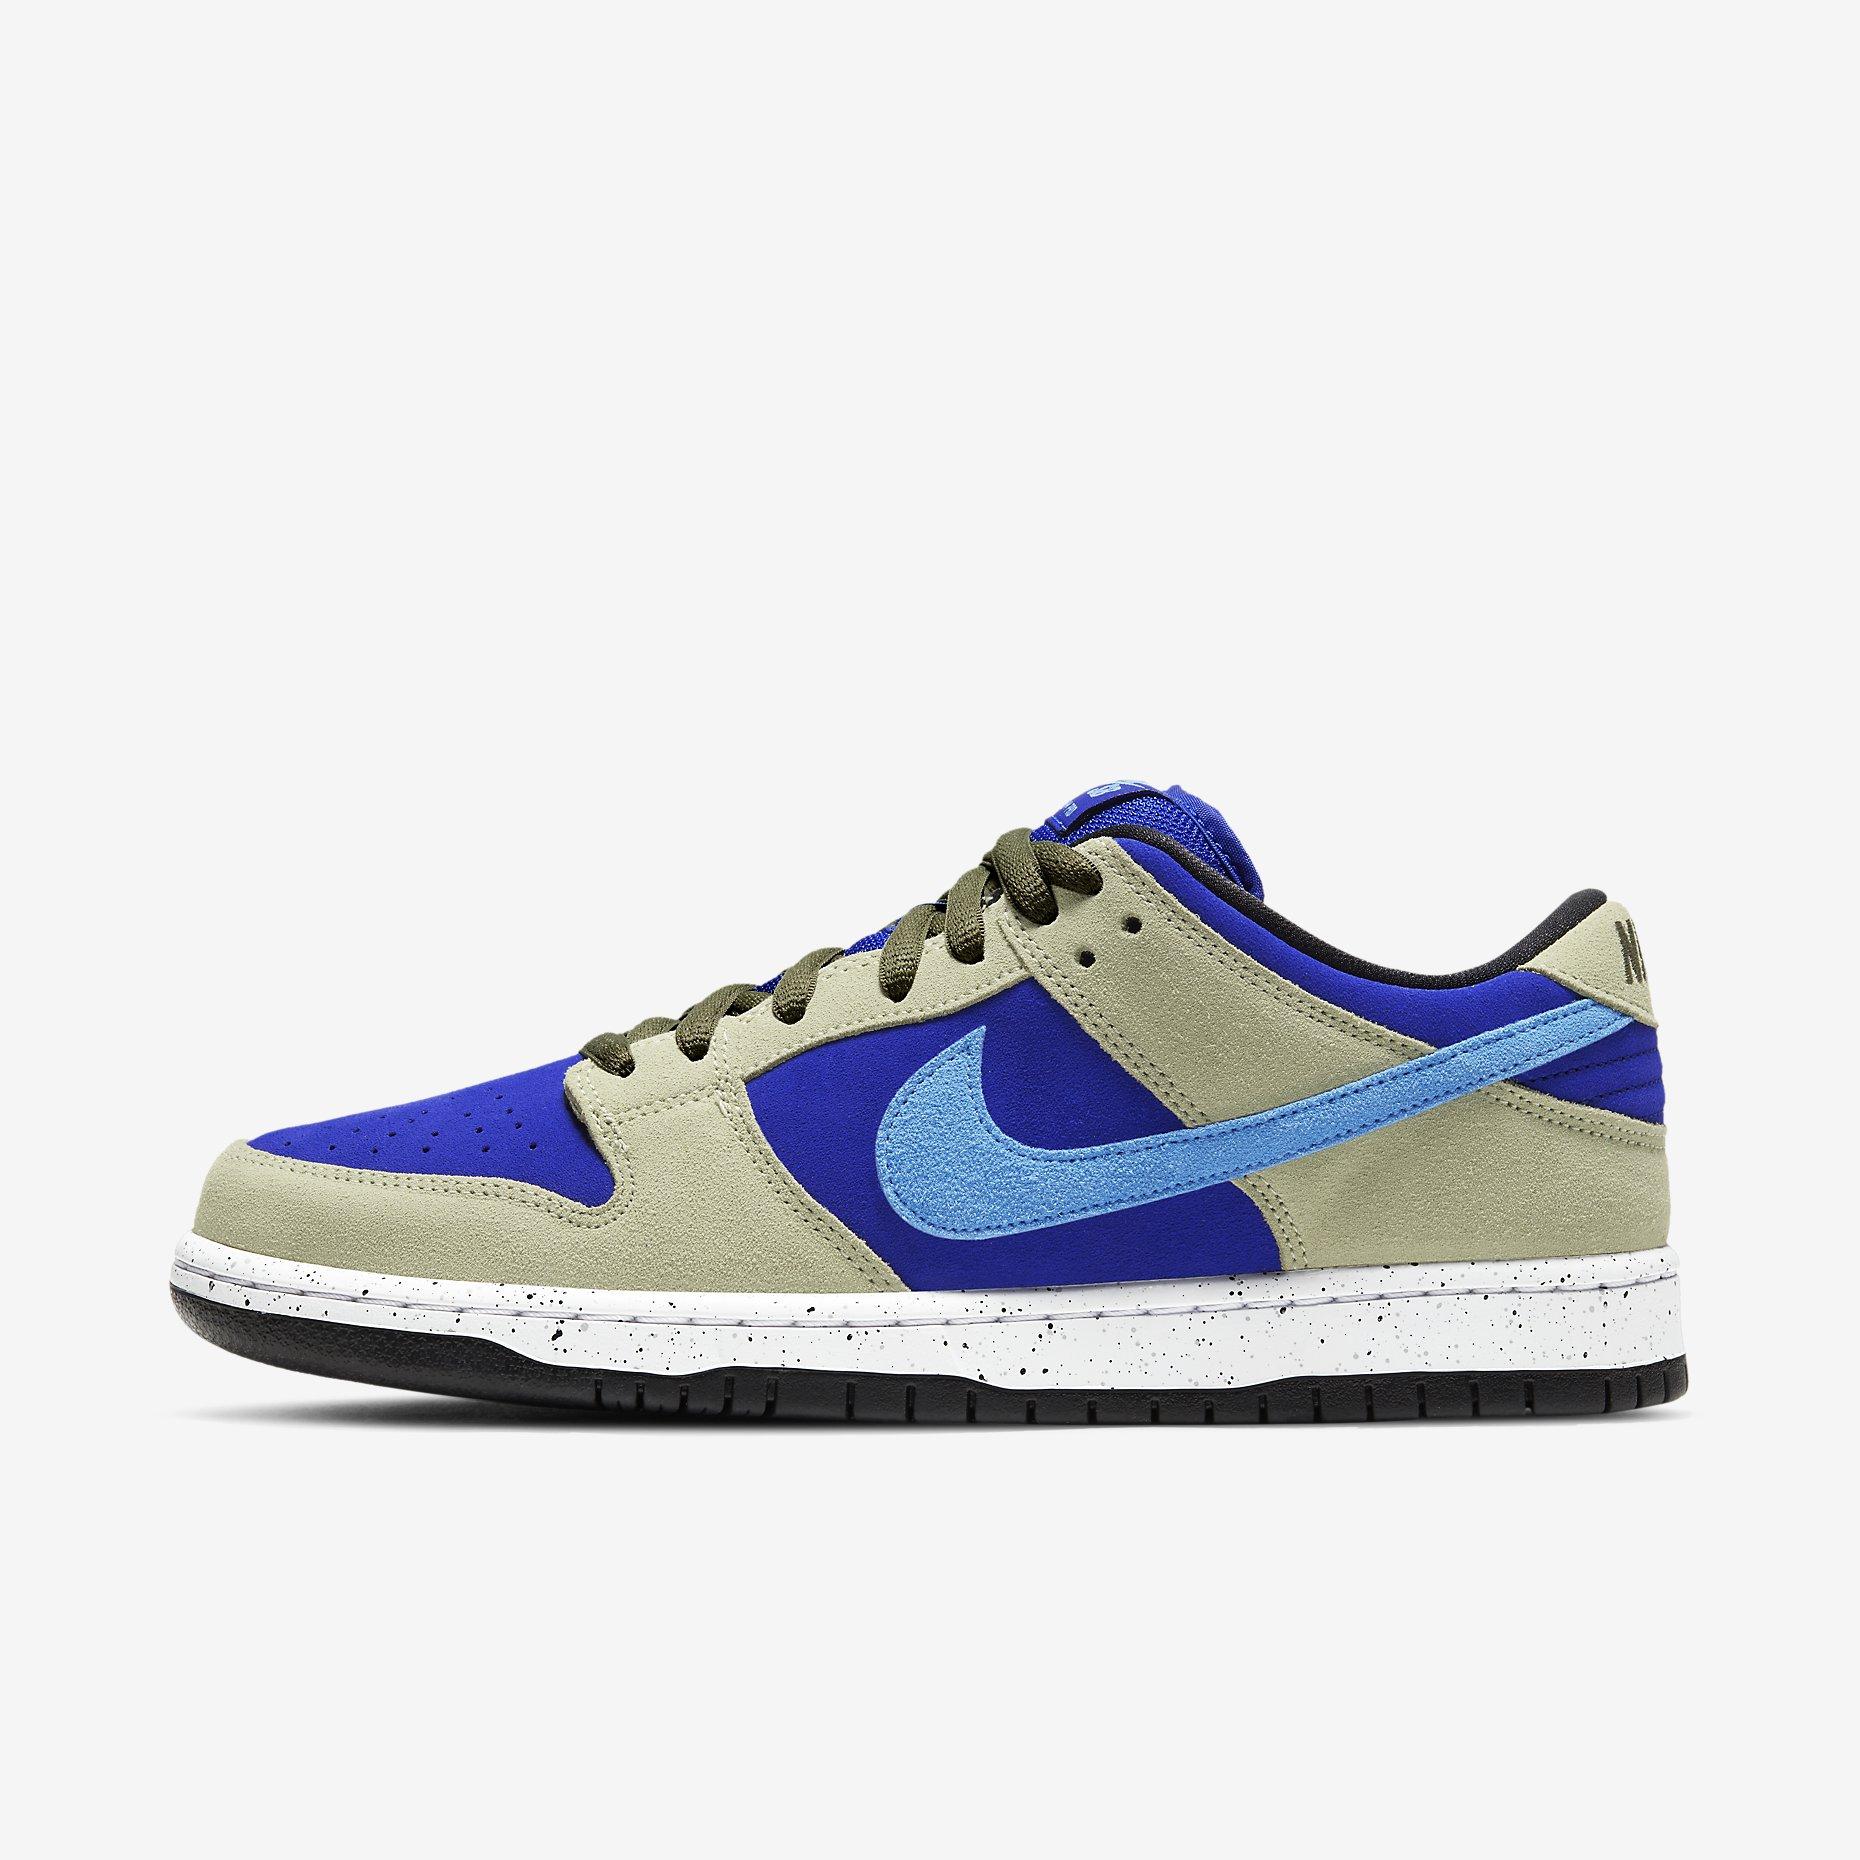 Nike Dunk Low SB 'ACG Celadon'}